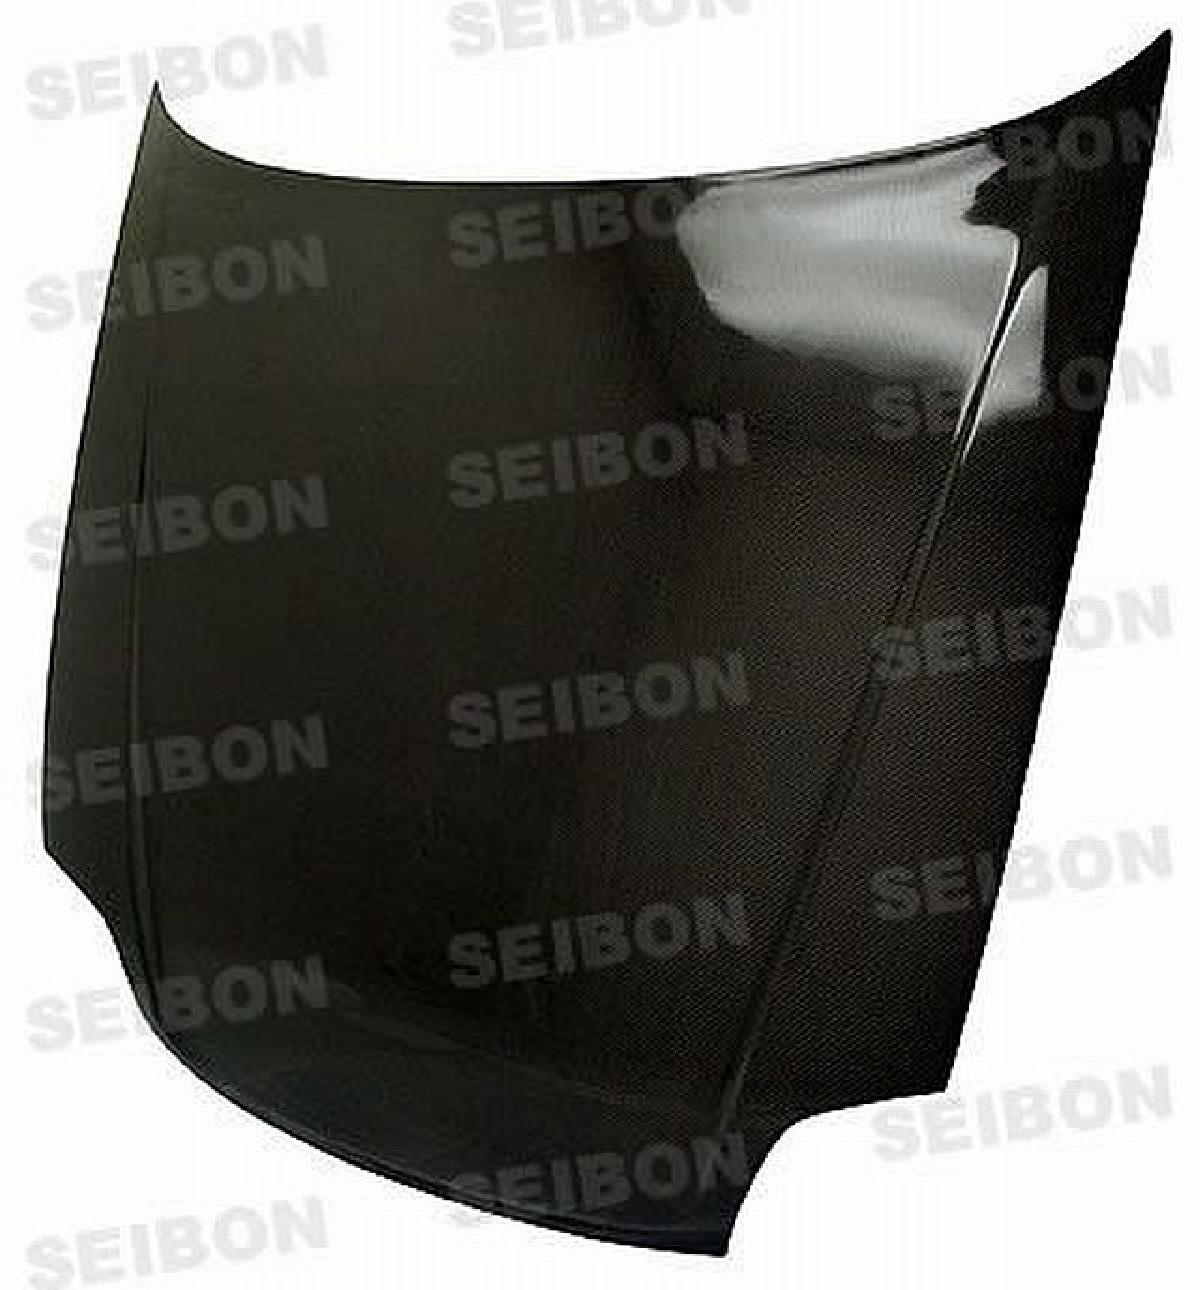 Seibon OEM Carbon Motorhaube Honda Prelude 97-02